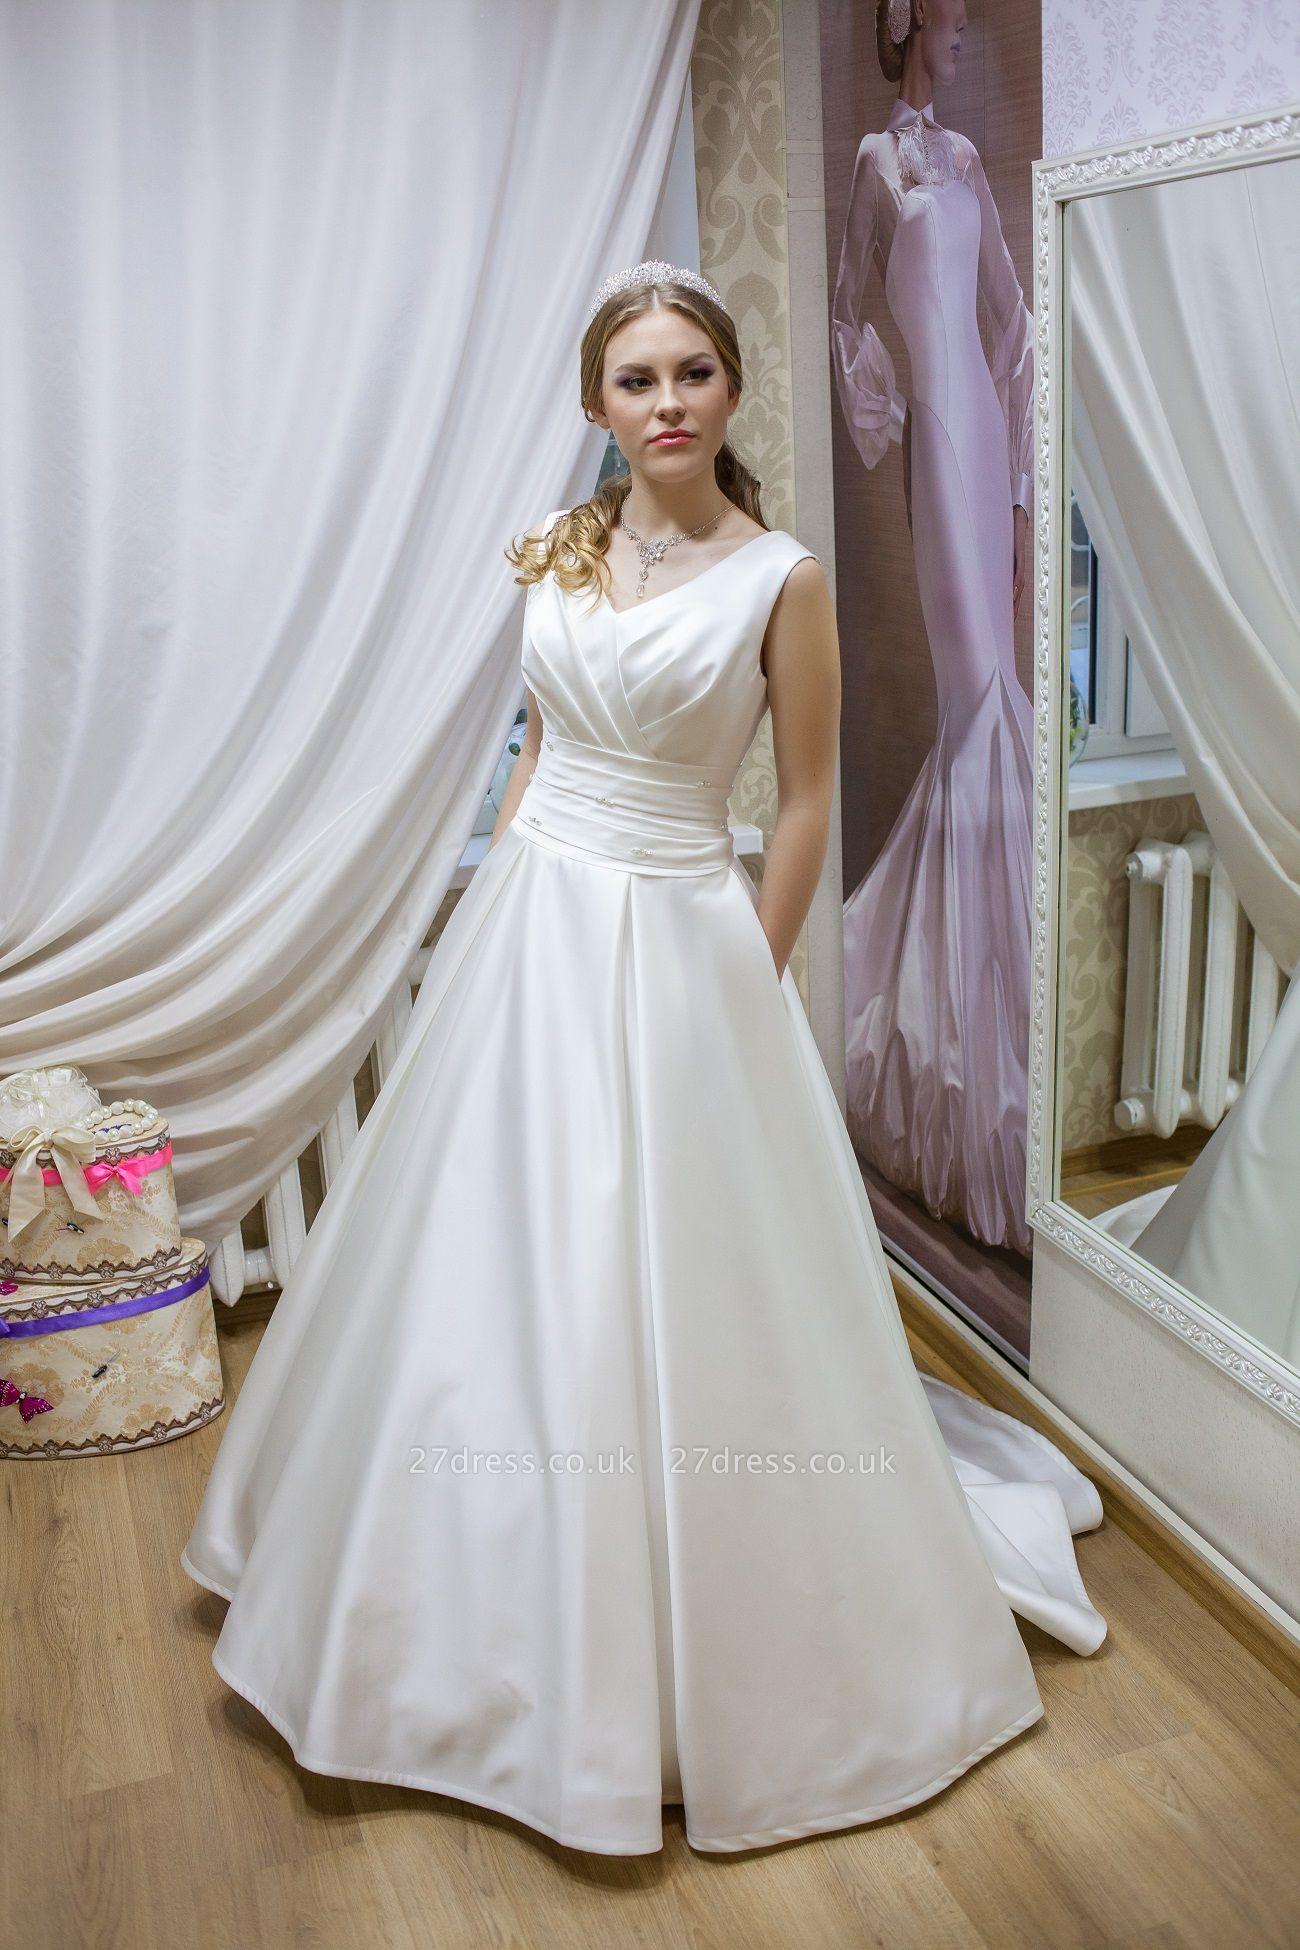 Modern V-neck Sleeveless Wedding Dress Lace-up With Bow